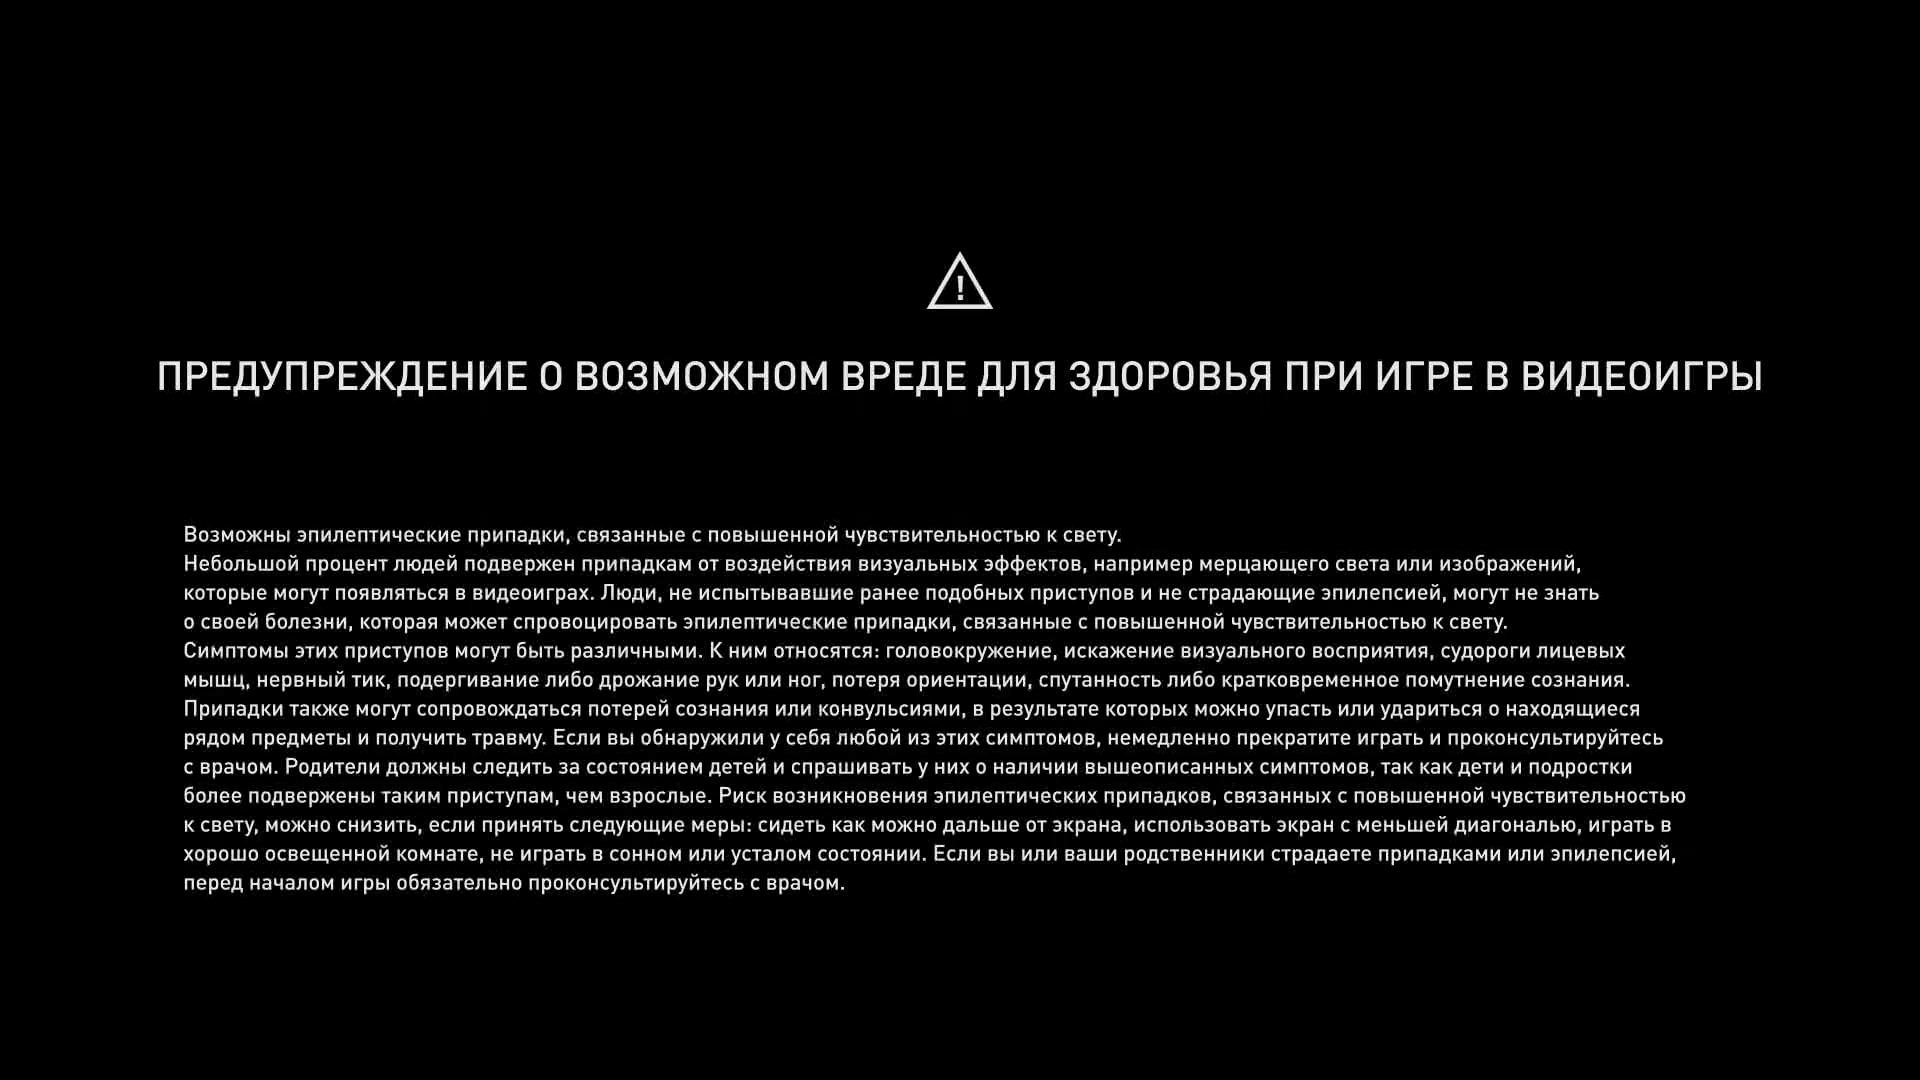 Assassin's Creed  Origins Screenshot 2019.08.13 - 00.41.20.98.png